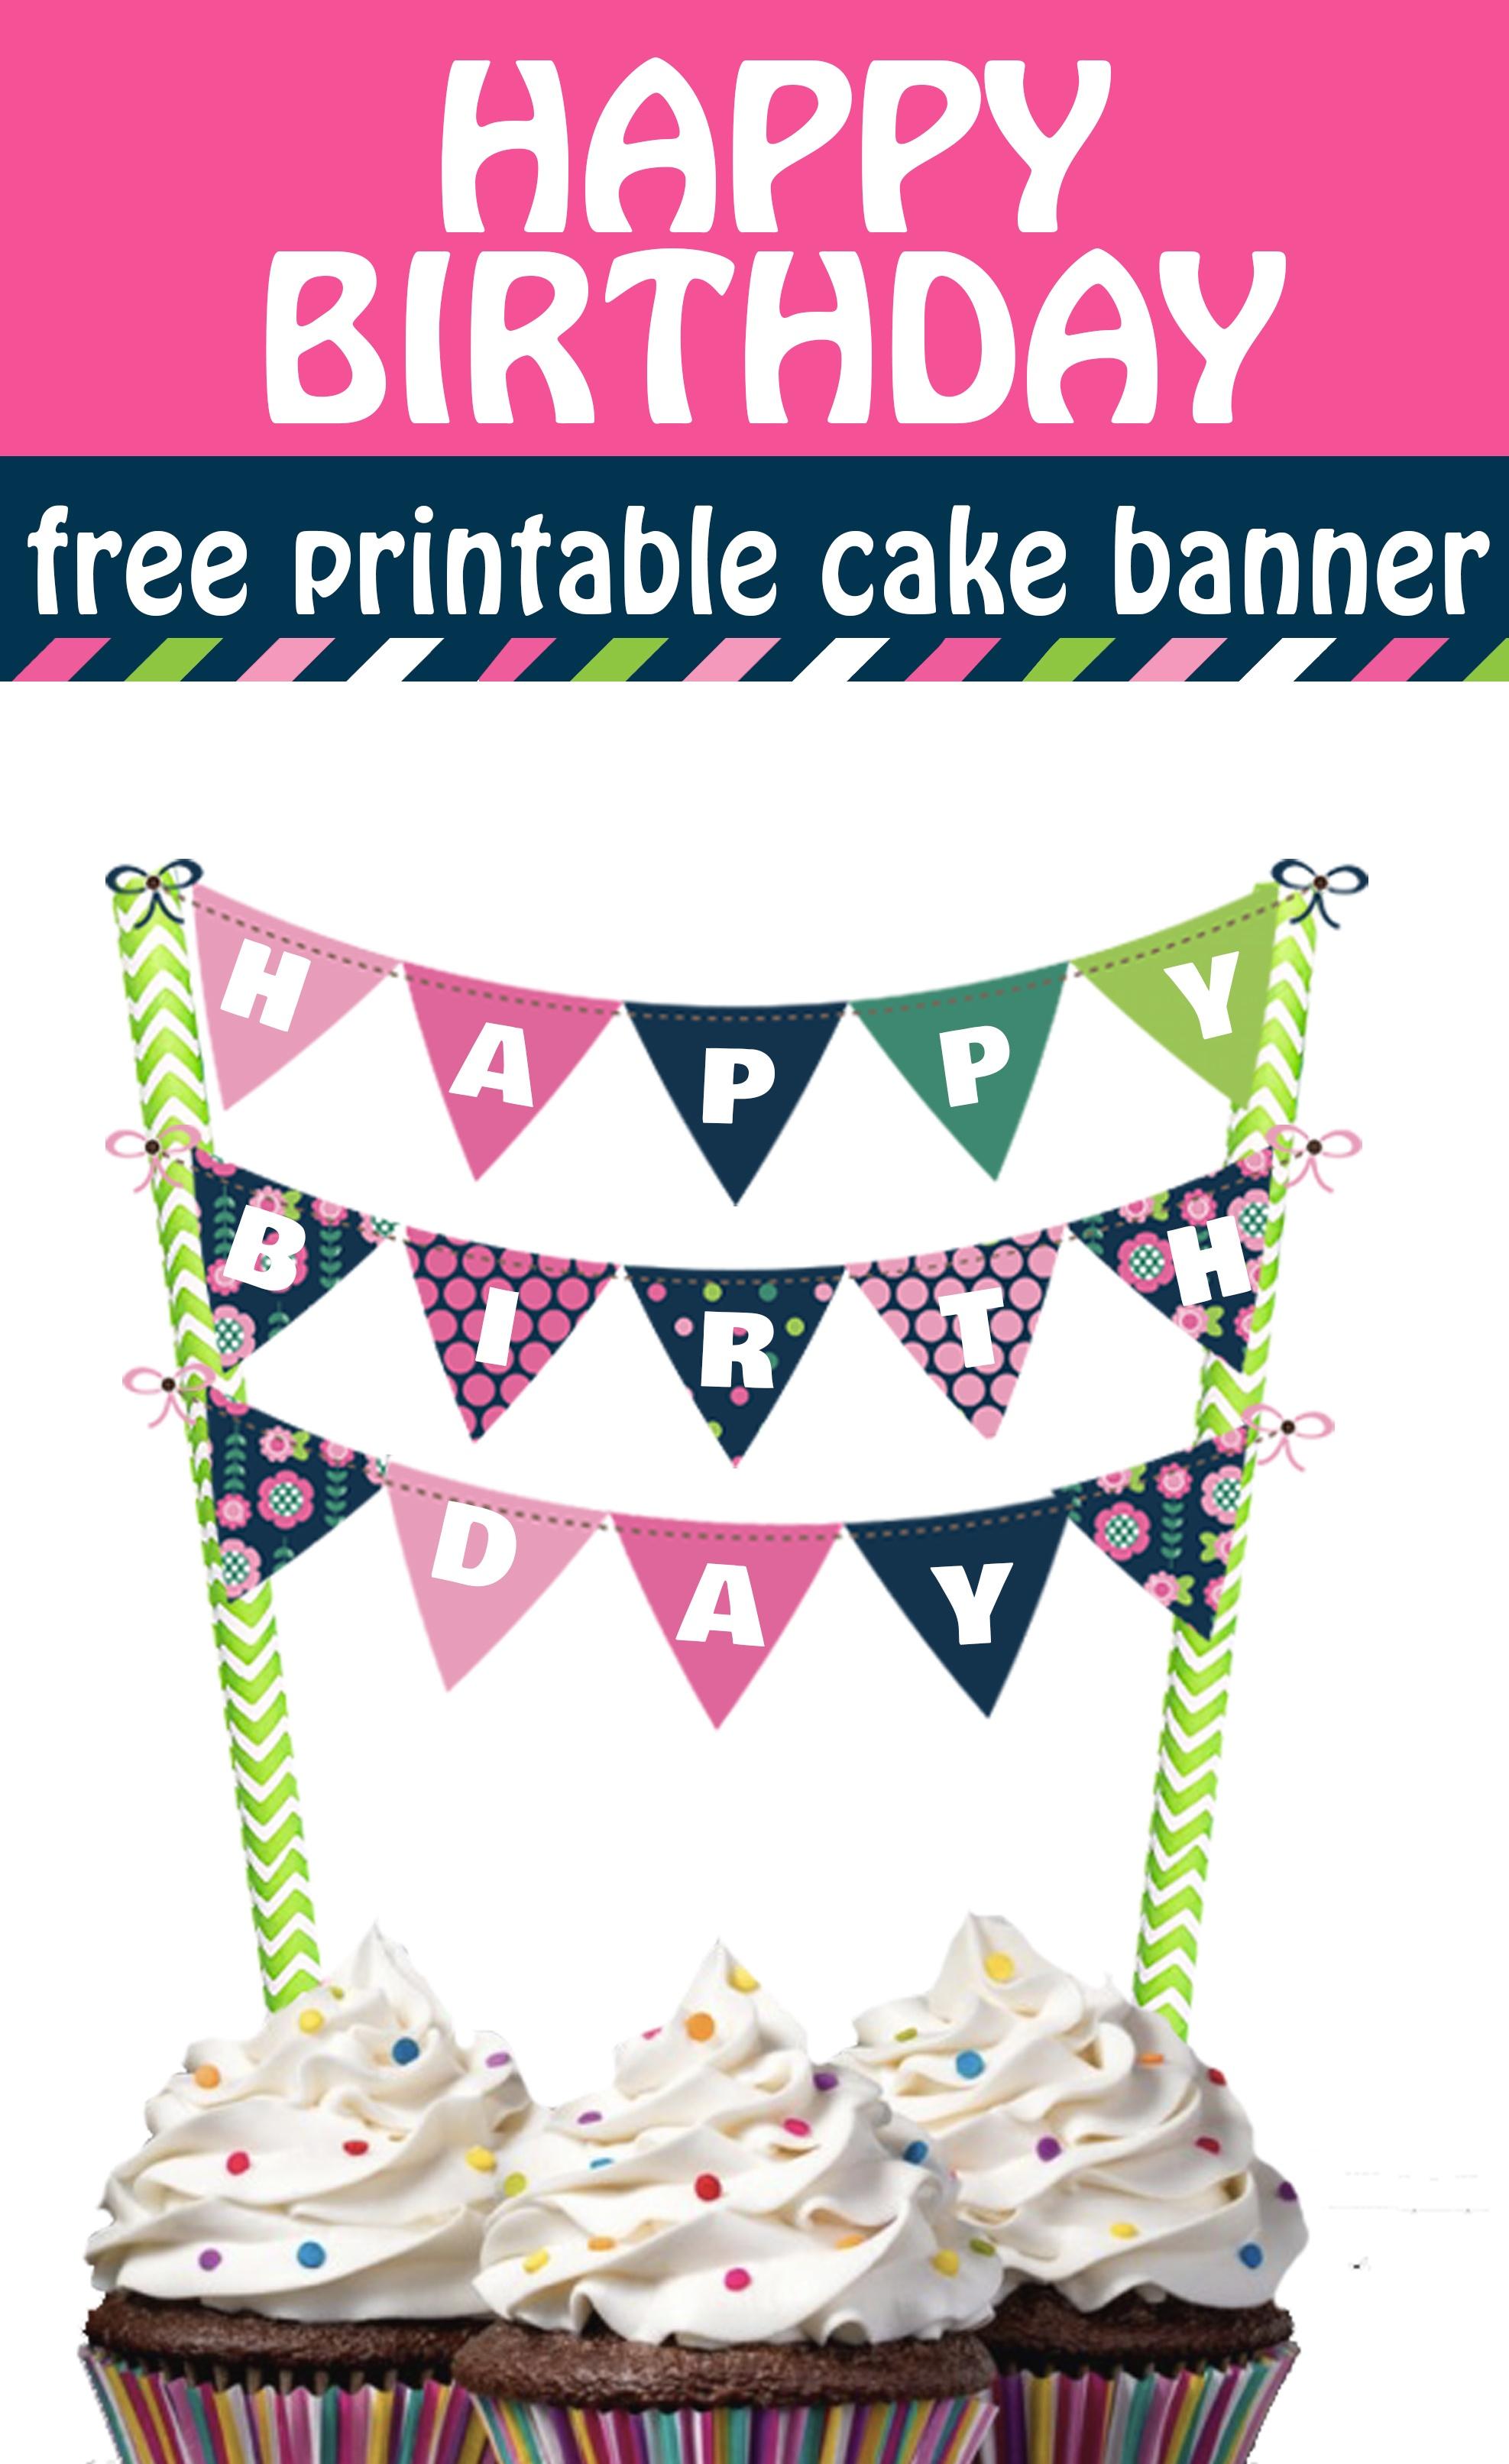 Cheerful And Bright Happy Birthday Cake Banner Free Printable - Happy Birthday Free Printable